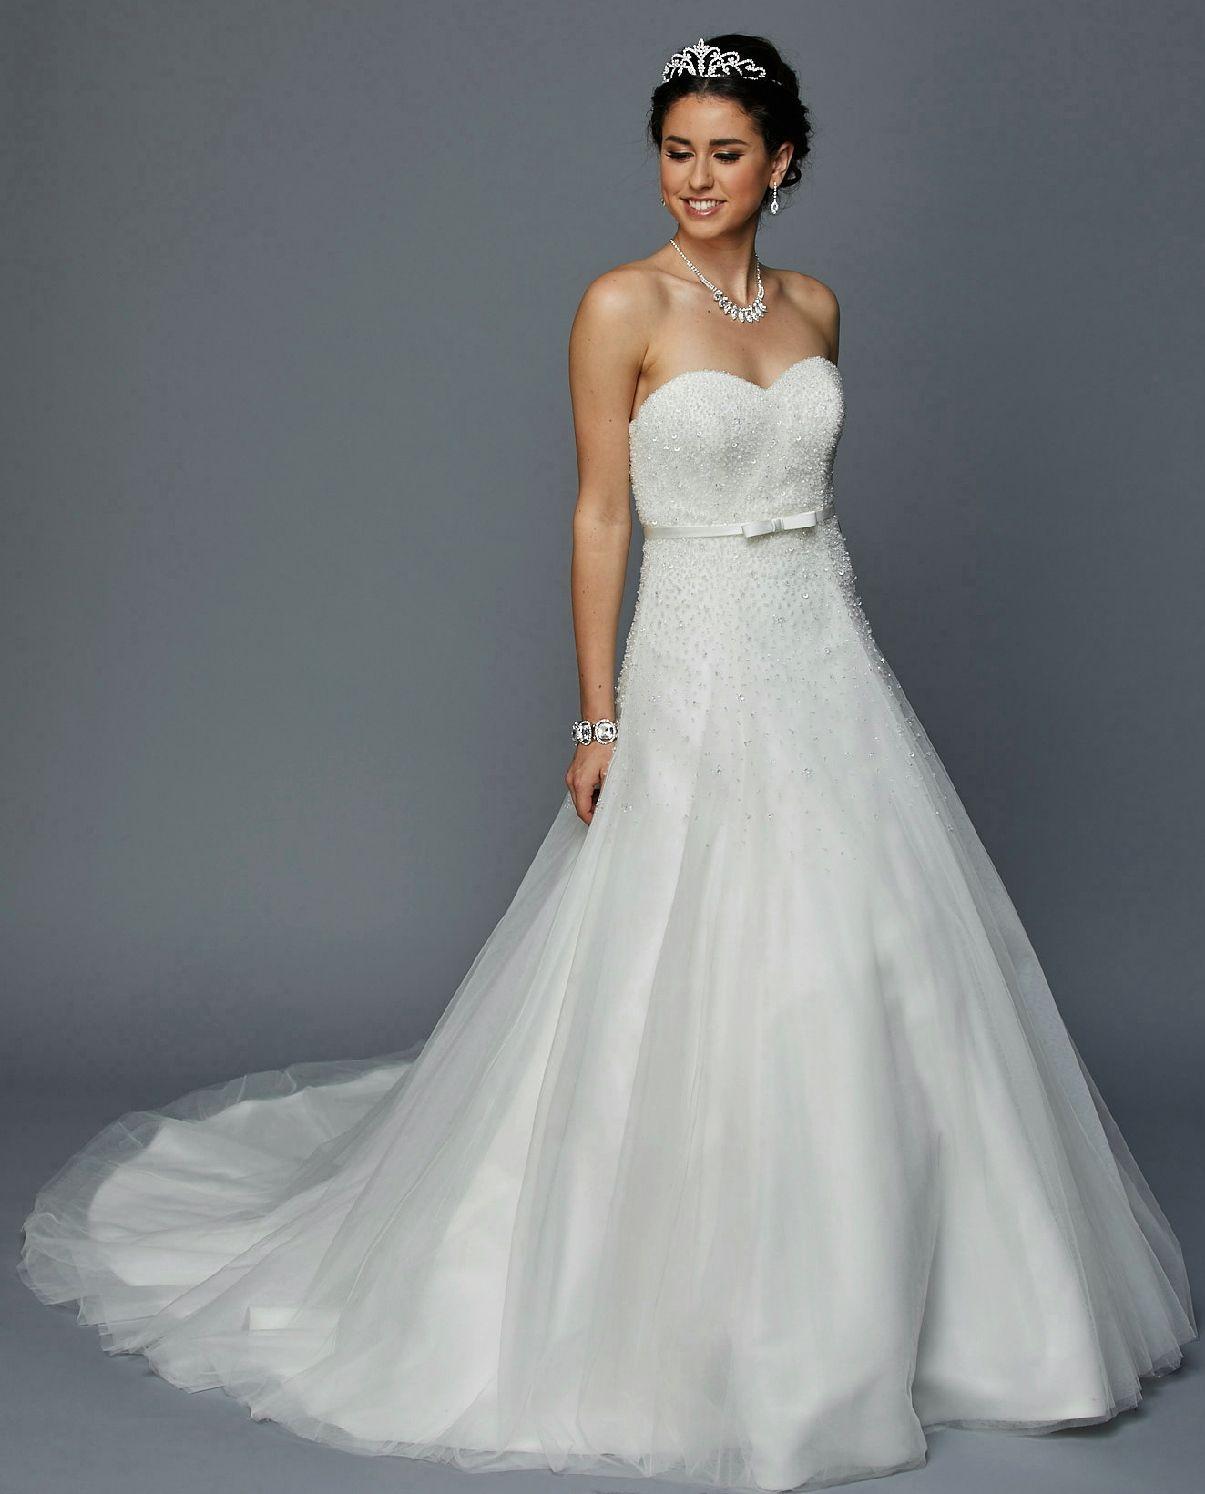 Wedding dressesl long white dressesucbrueajtucbruestrapless